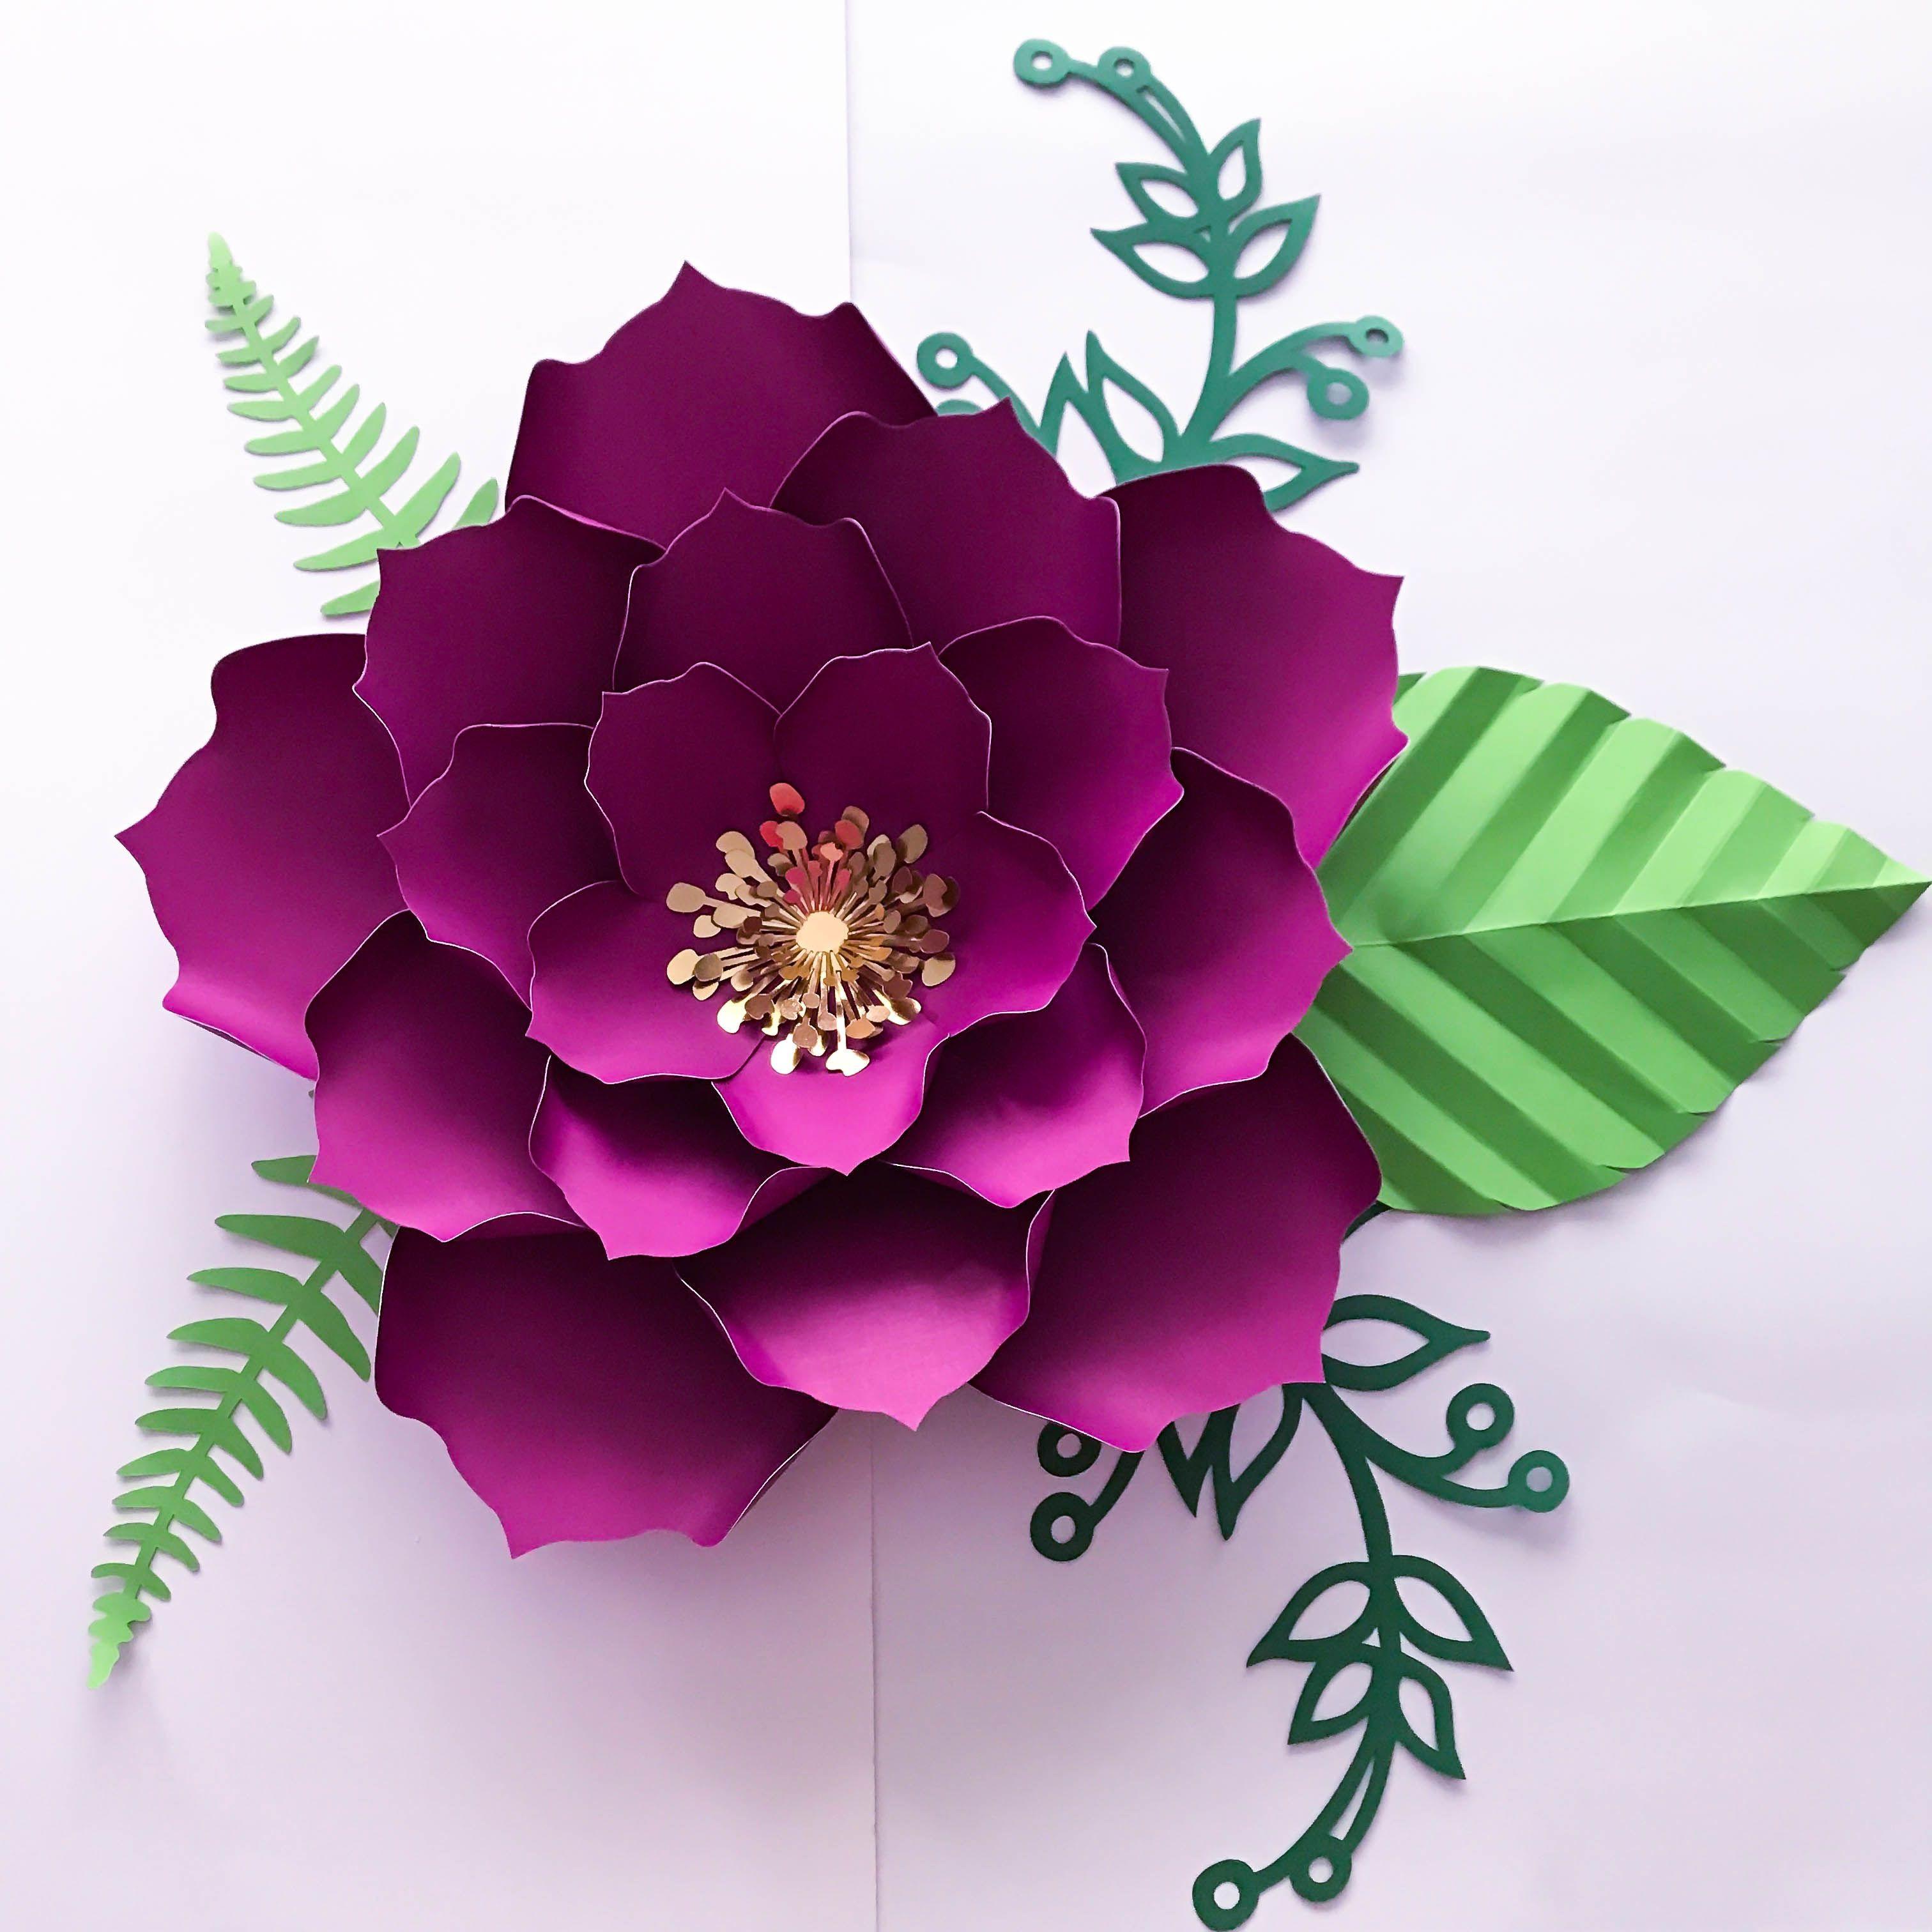 SVG Petal  Paper Flower Template DIGITAL Version  Cricut and